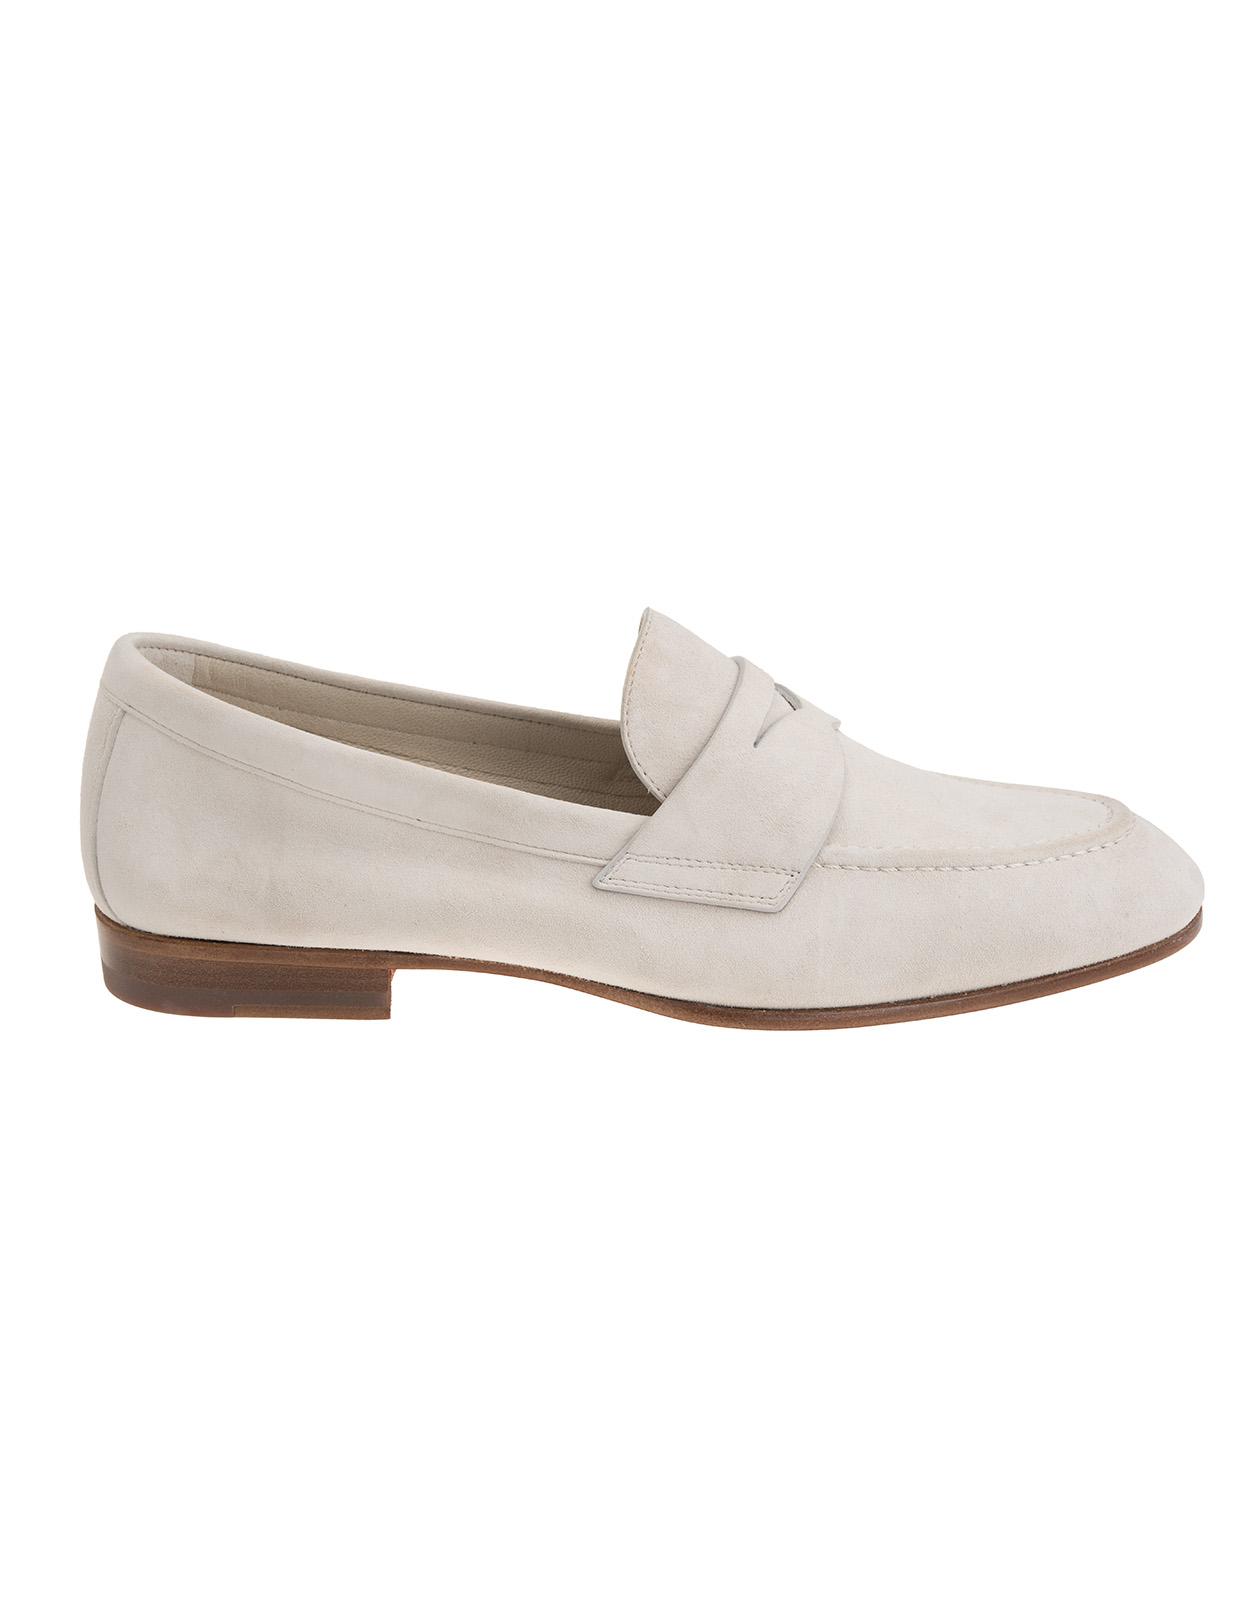 23bb75155599 Light Grey Suede Loafers - SANTONI - Russocapri